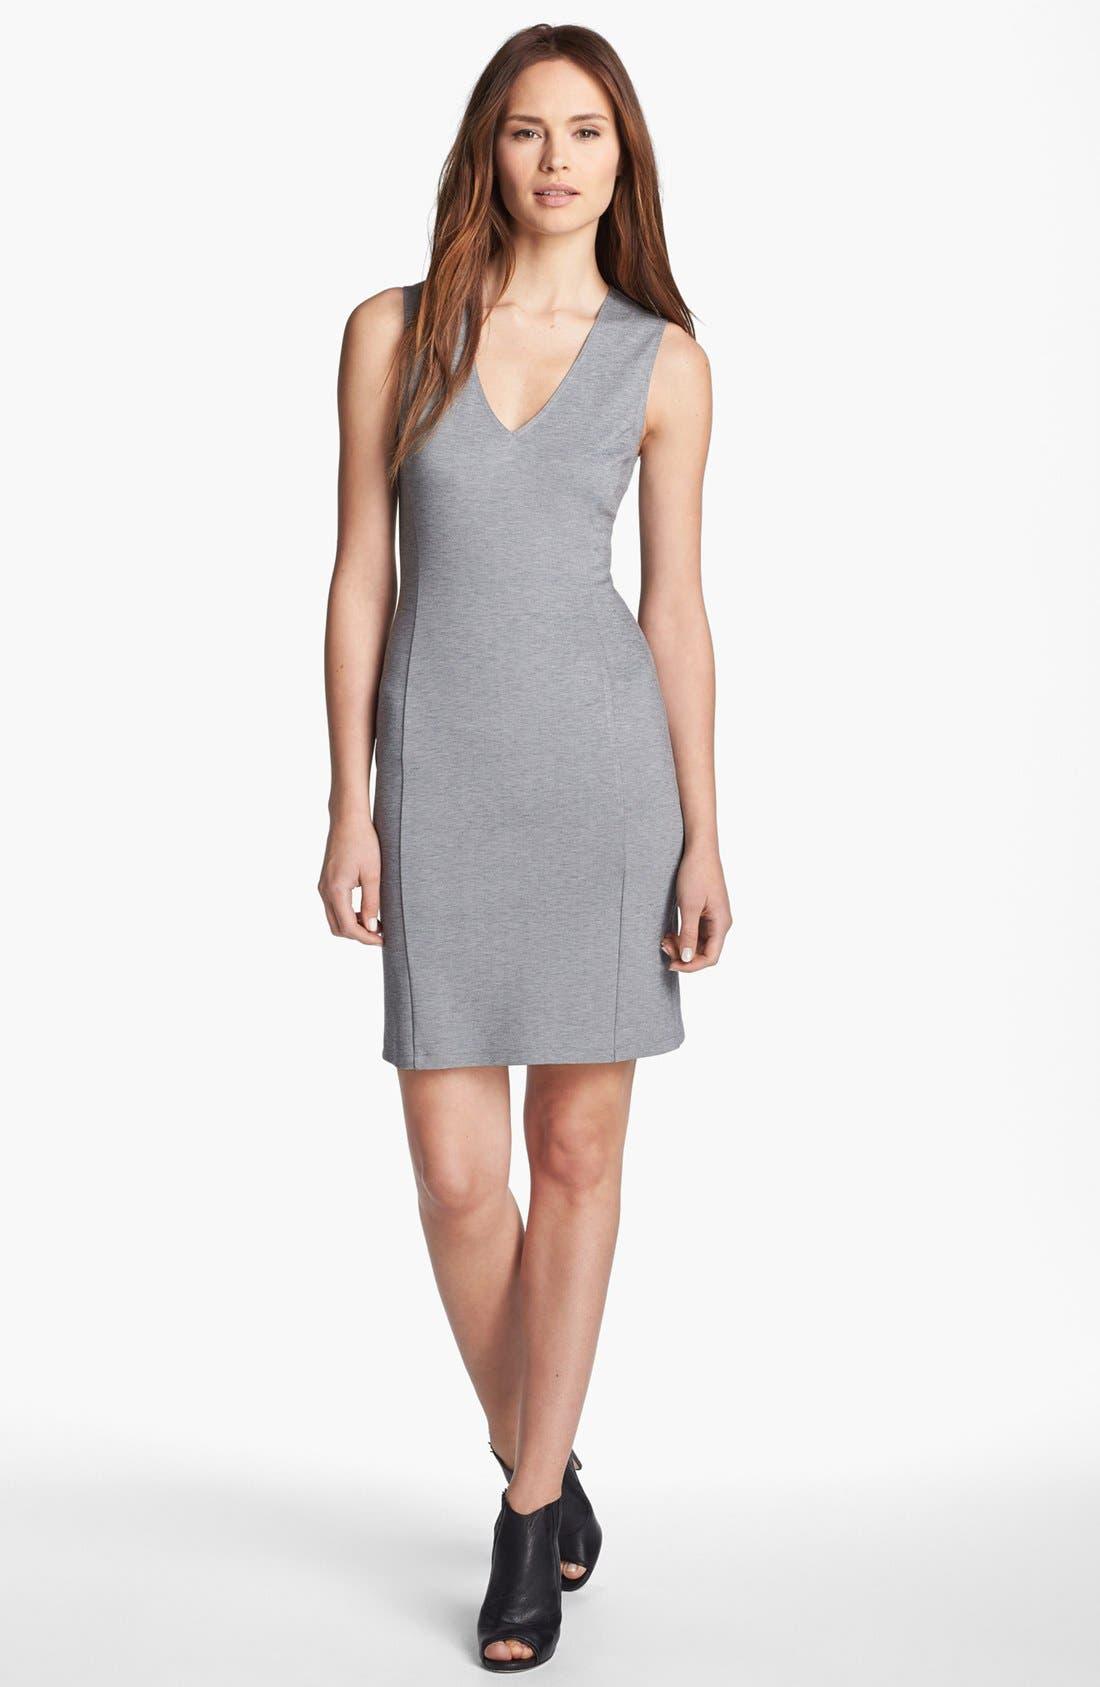 Alternate Image 1 Selected - Theory 'Adoxa' Stretch Sheath Dress